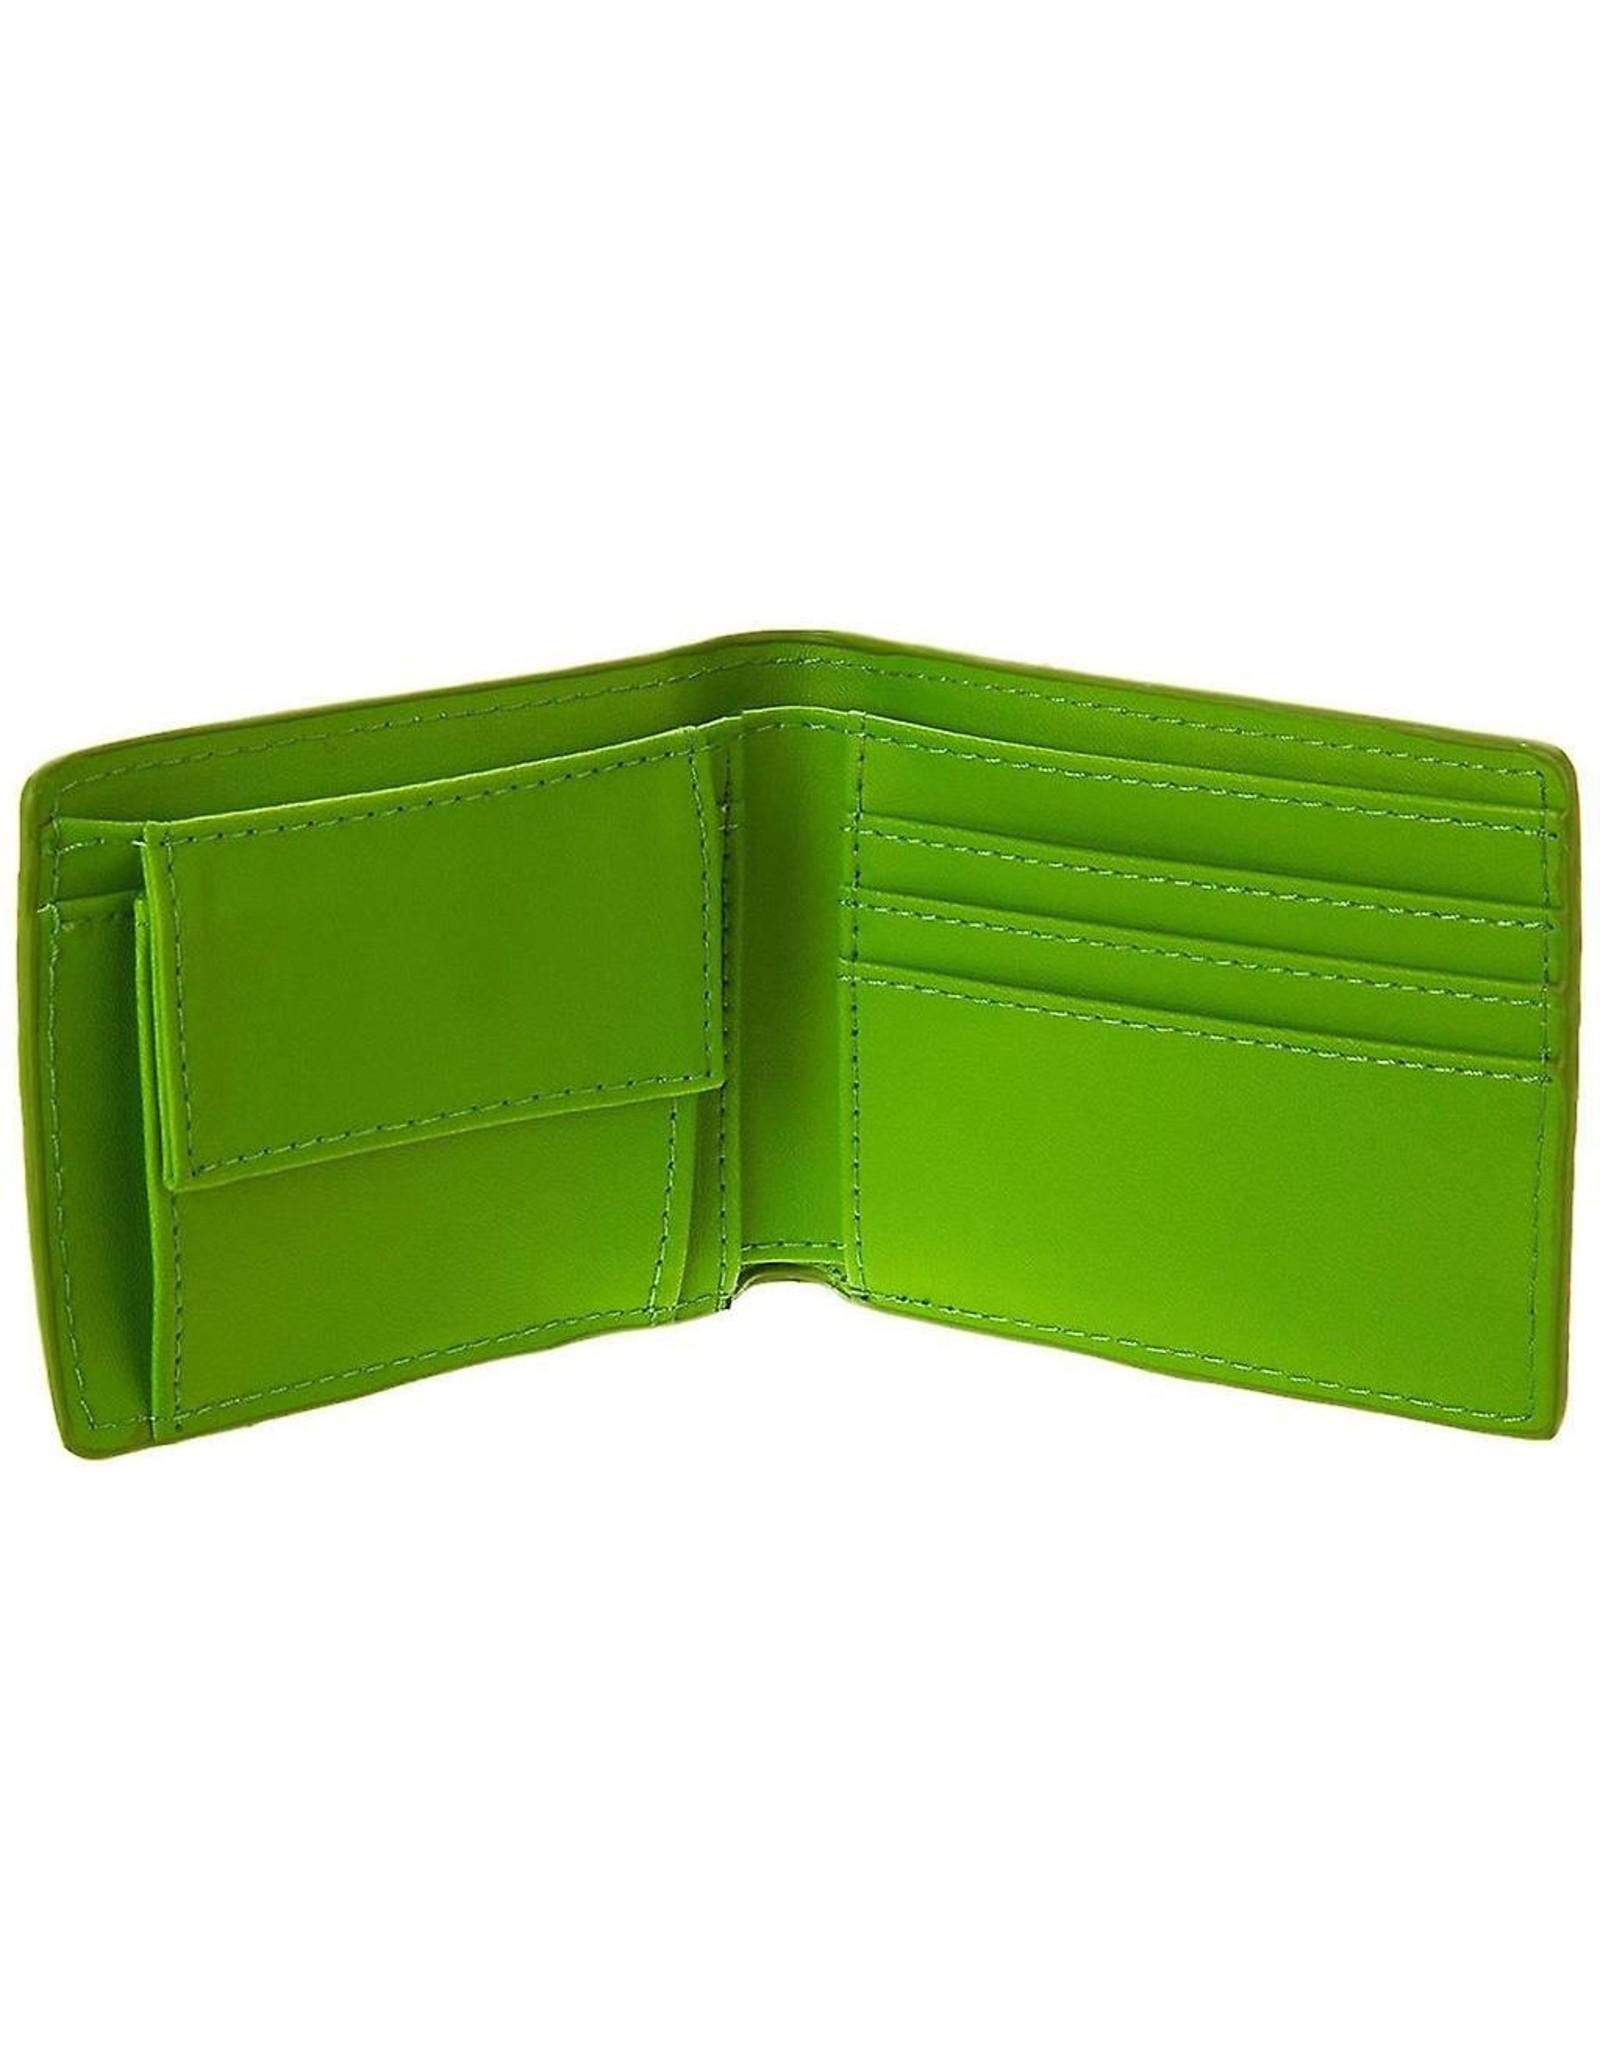 Ninja Turtles Merchandise portemonnees - Ninja Turtles - Giftset Portemonnee en Sleutelhanger